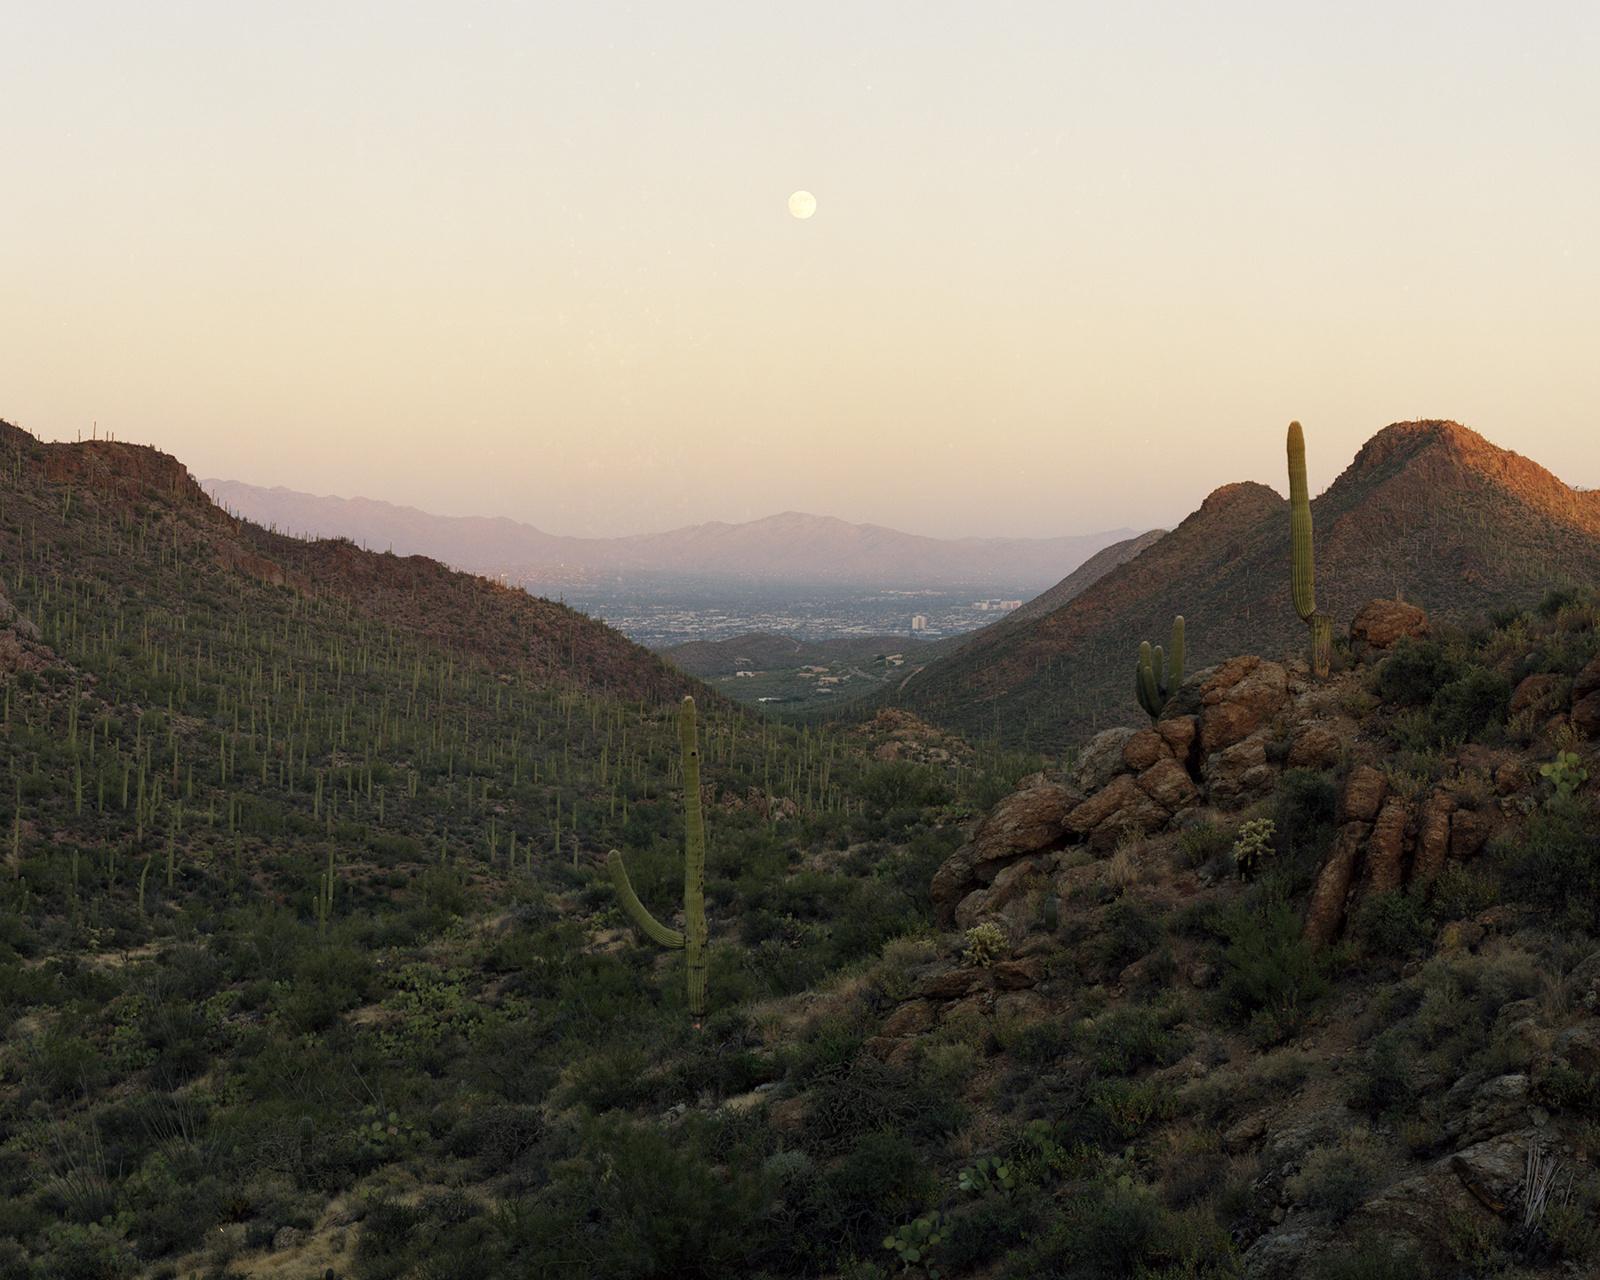 Toward Tucson, Arizona